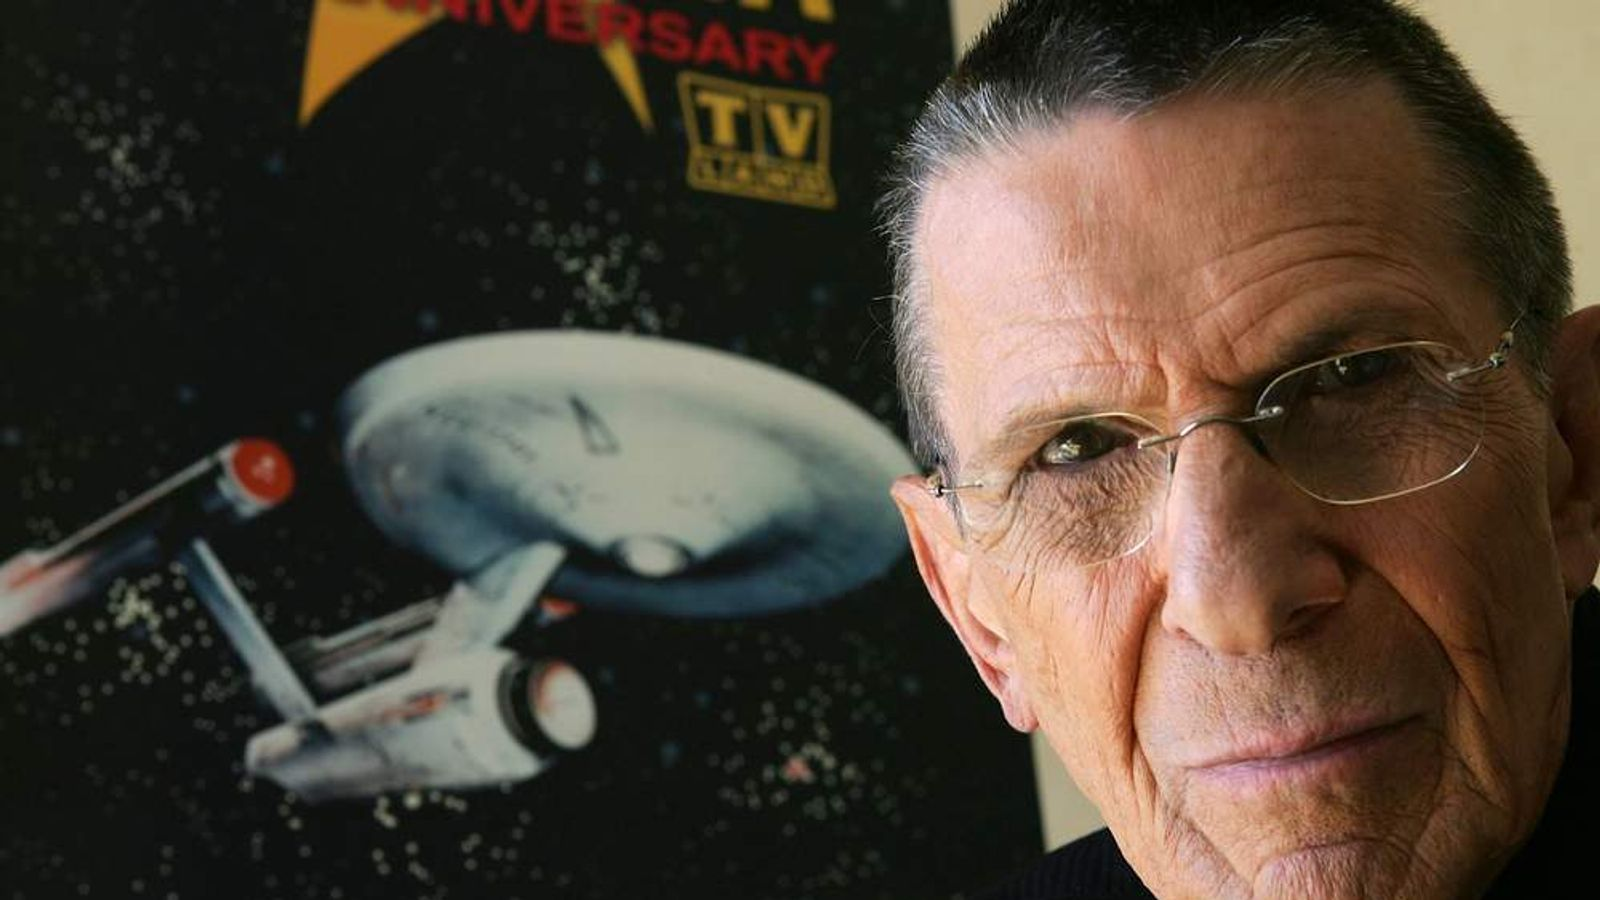 Star Trek's 40th Anniversary On TV Land